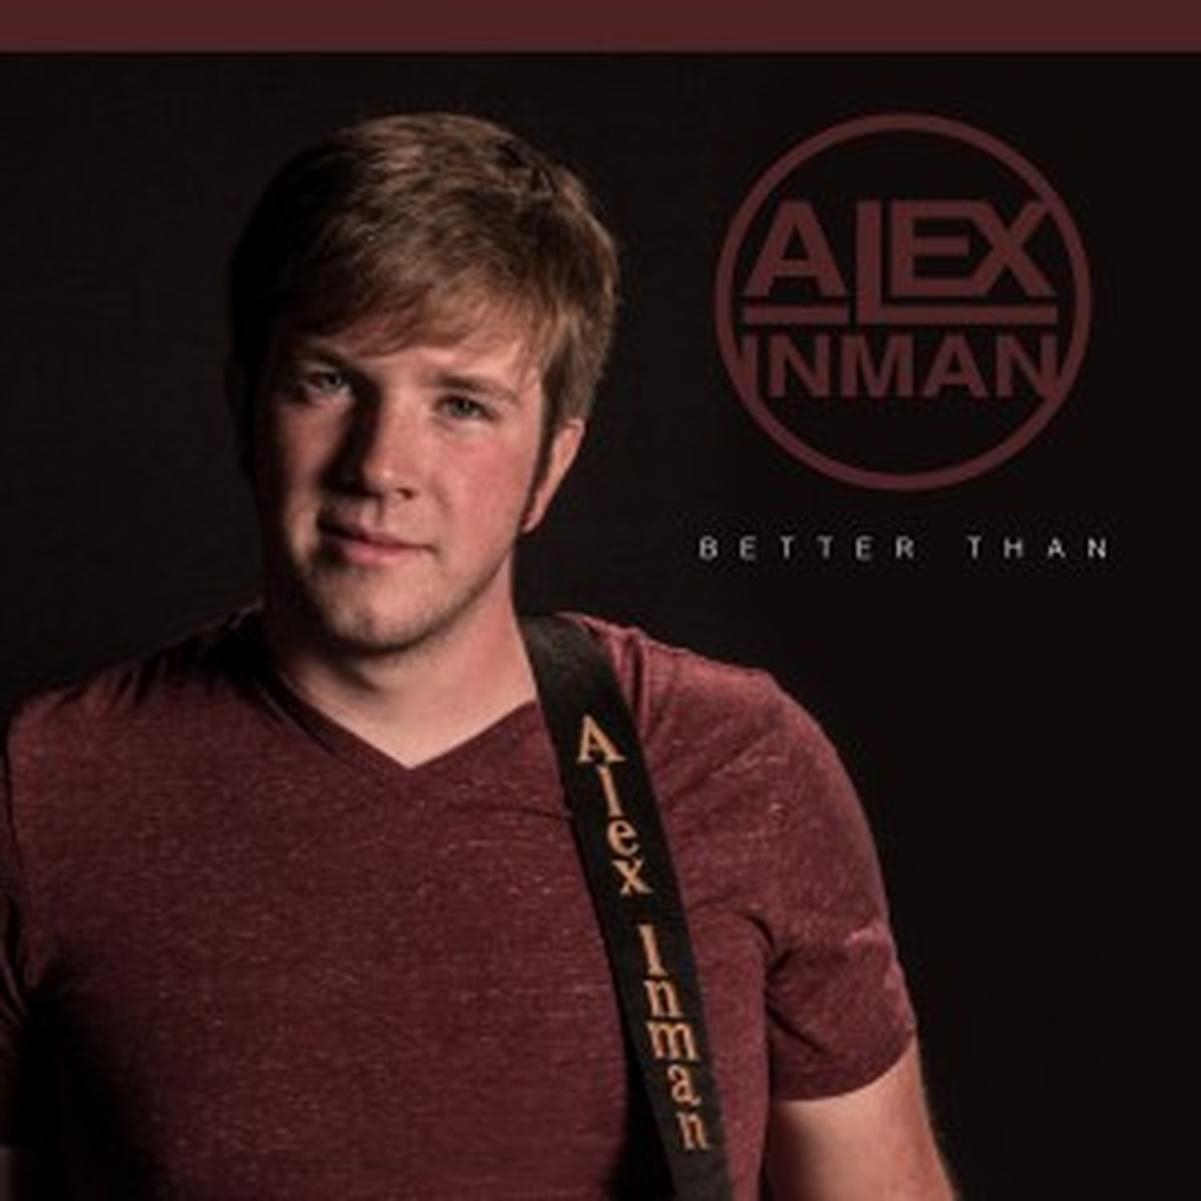 Alex Inman wiki, Alex Inman review, Alex Inman history, Alex Inman news